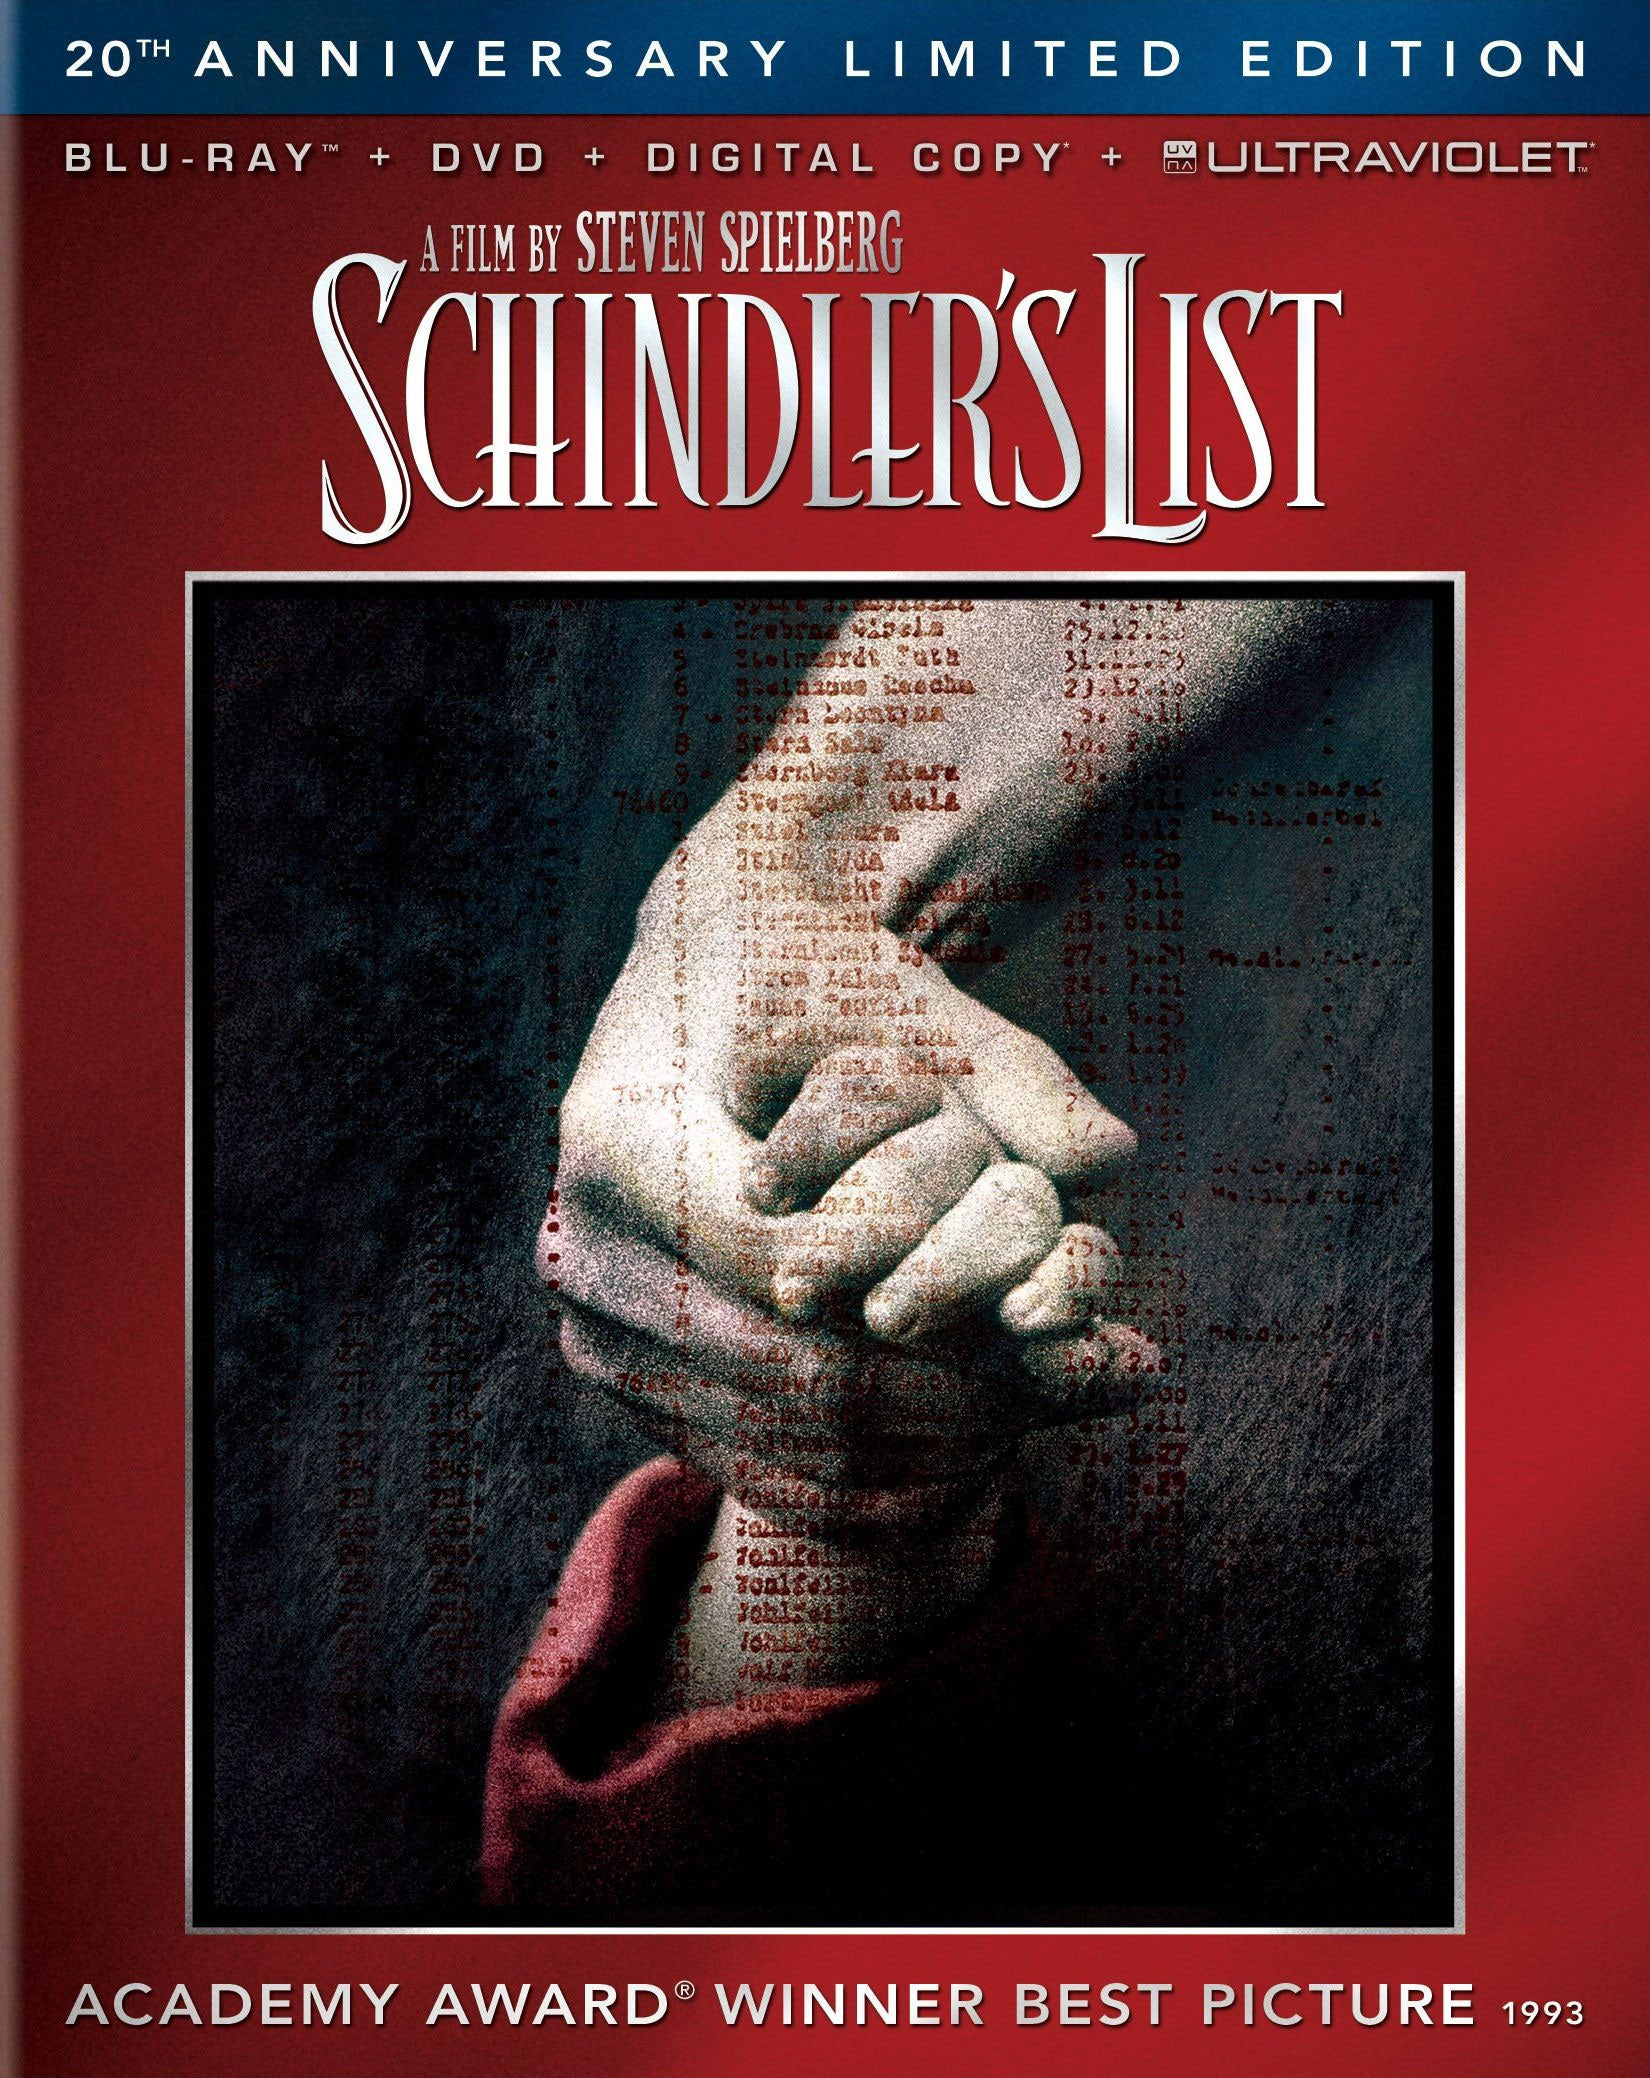 Schindler's List (20th Anniversary Edition) (Blu-ray/DVD)